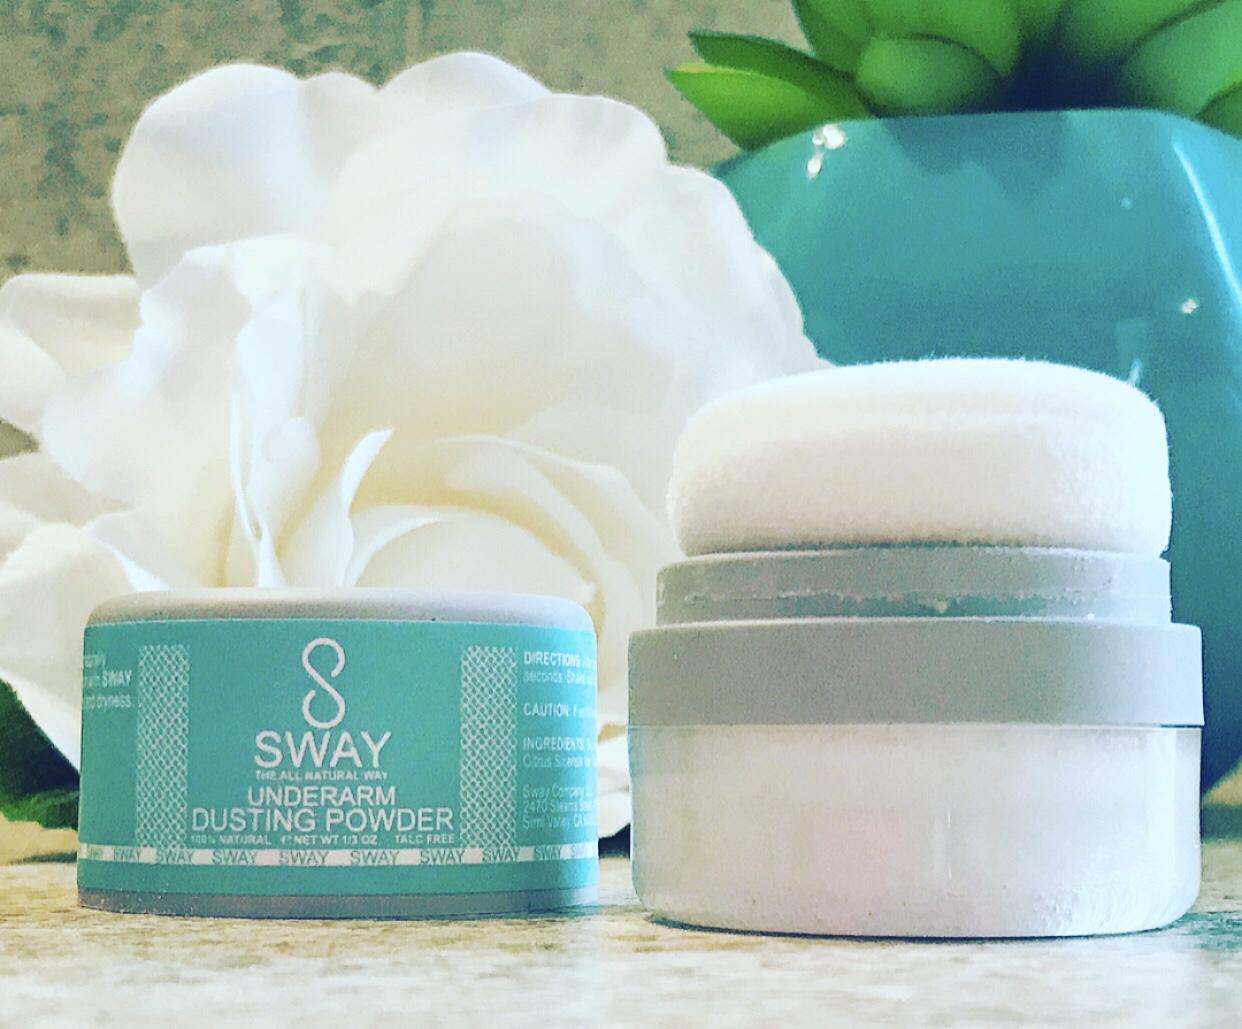 SWAY Underarm Detox Deodorant Vegan